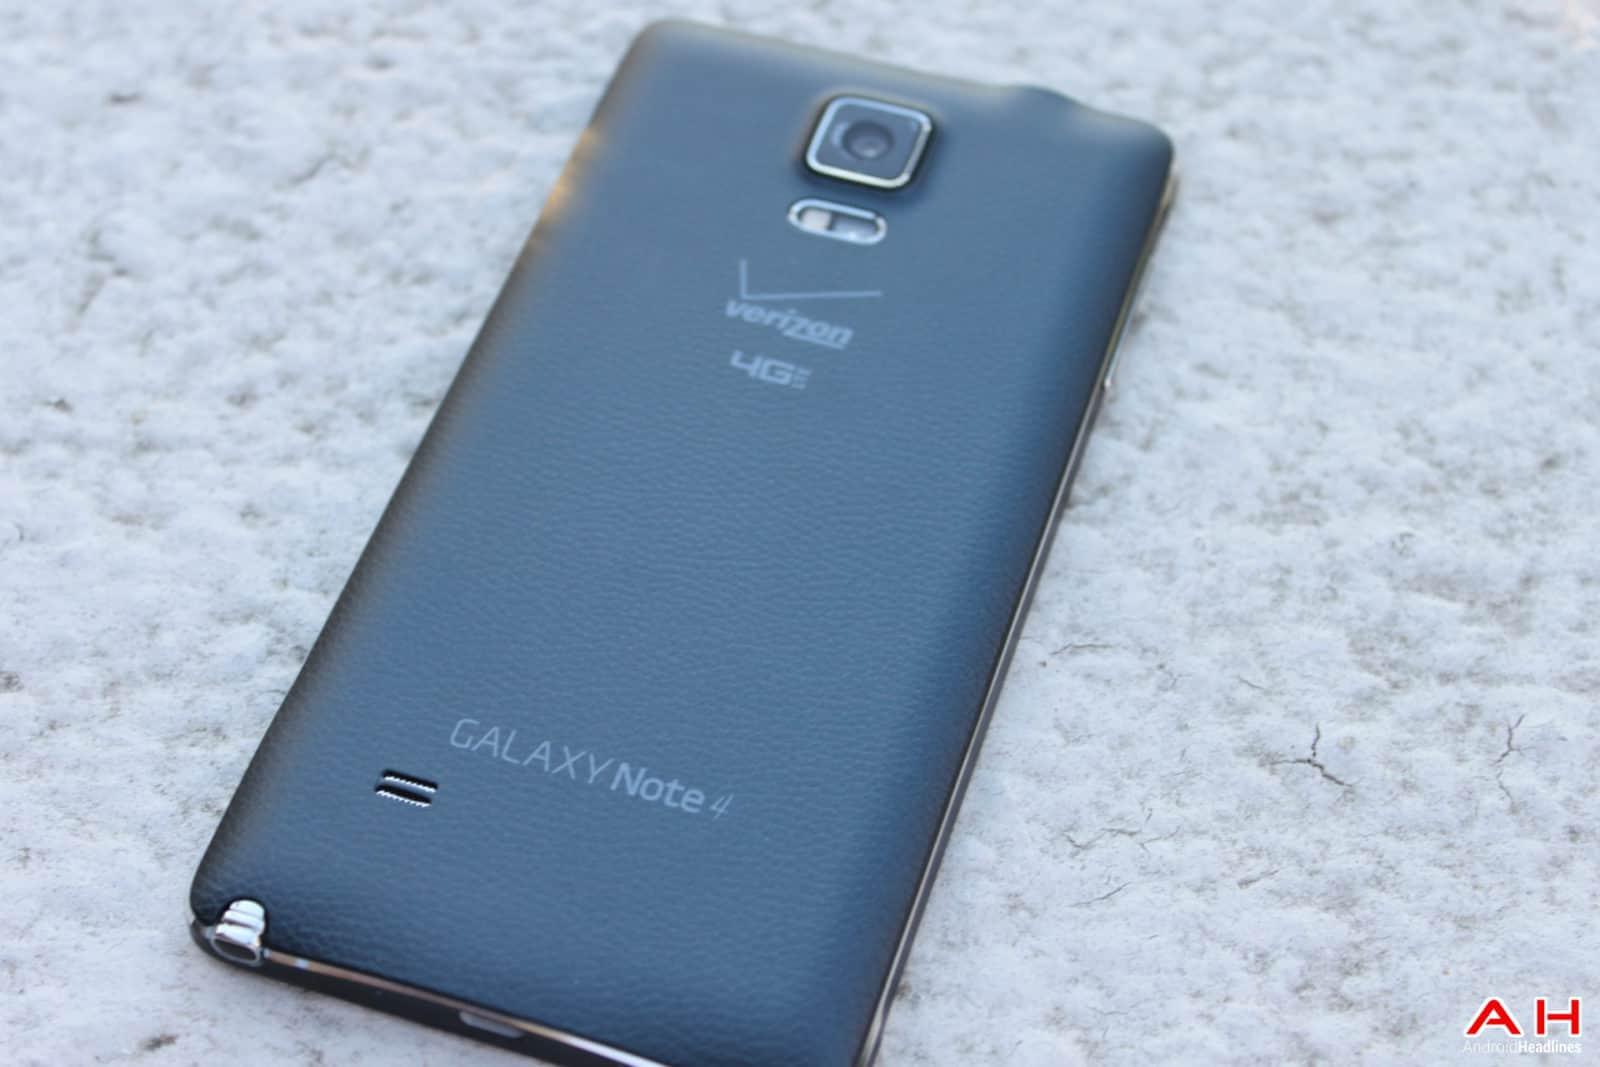 AH Samsung Galaxy Note 4-19